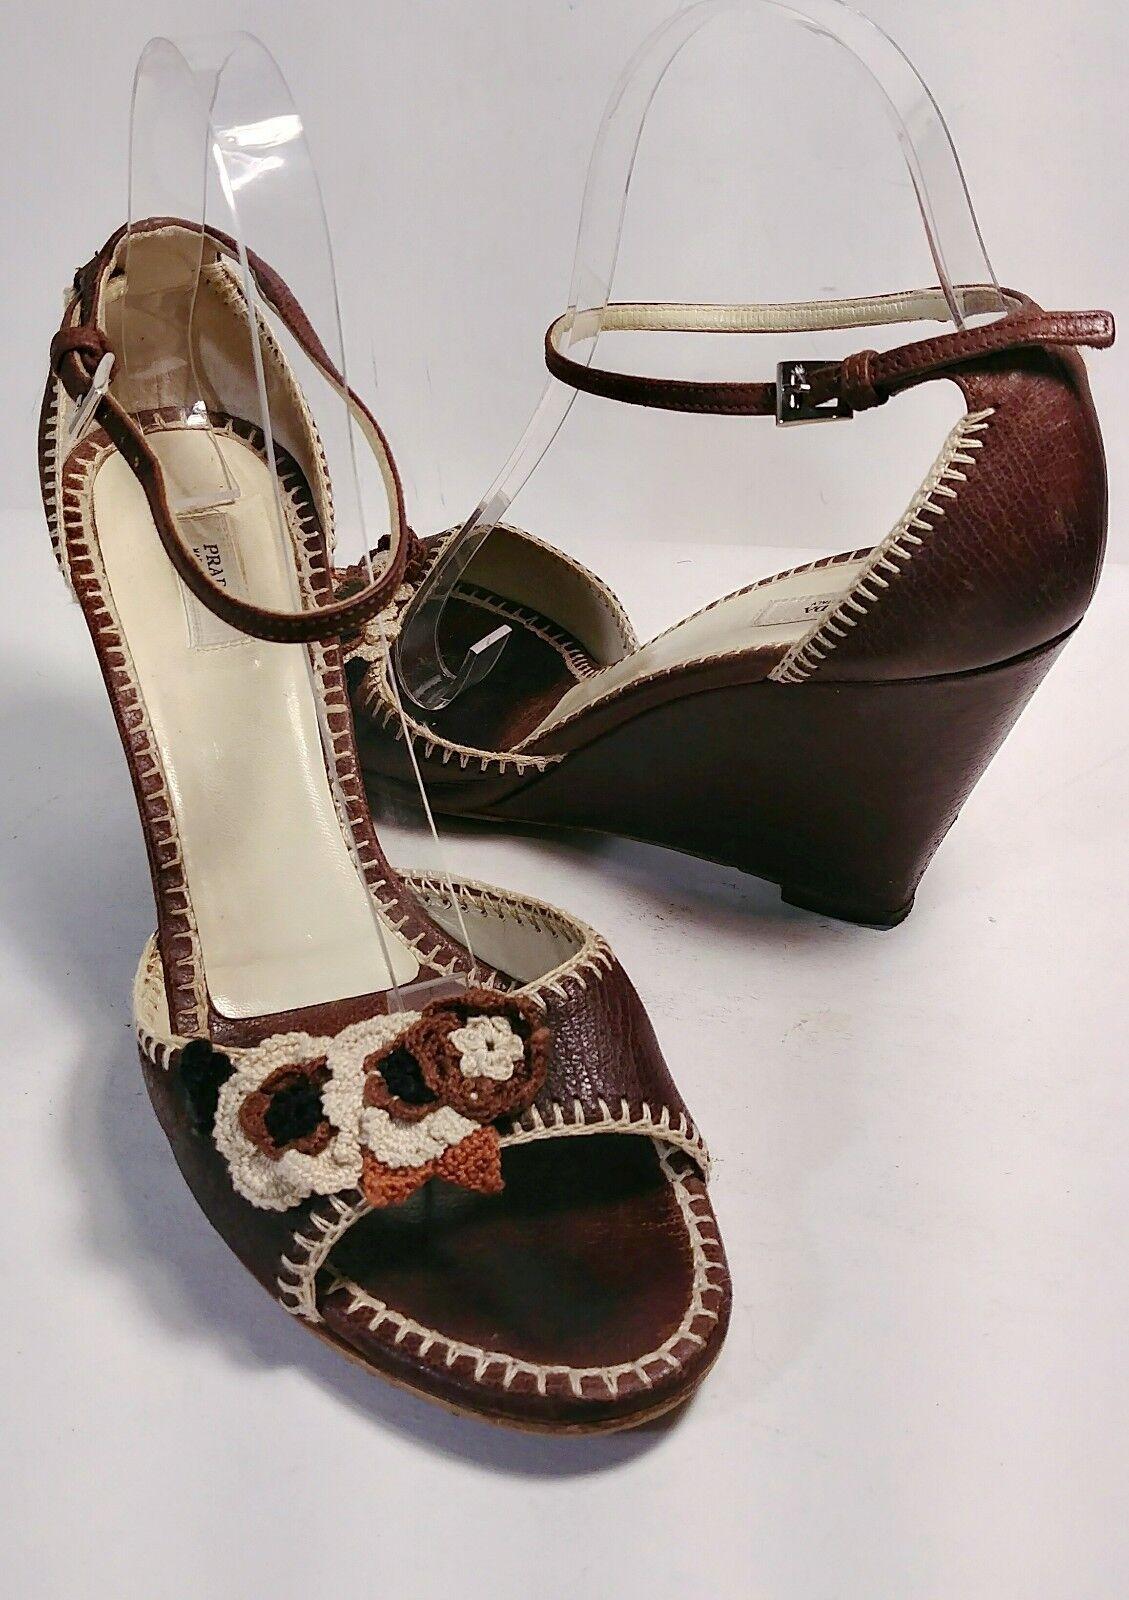 PRADA Brown Leather Crochet Flower Wedge Heel Sandals Women's Size US 7.5 EU 38